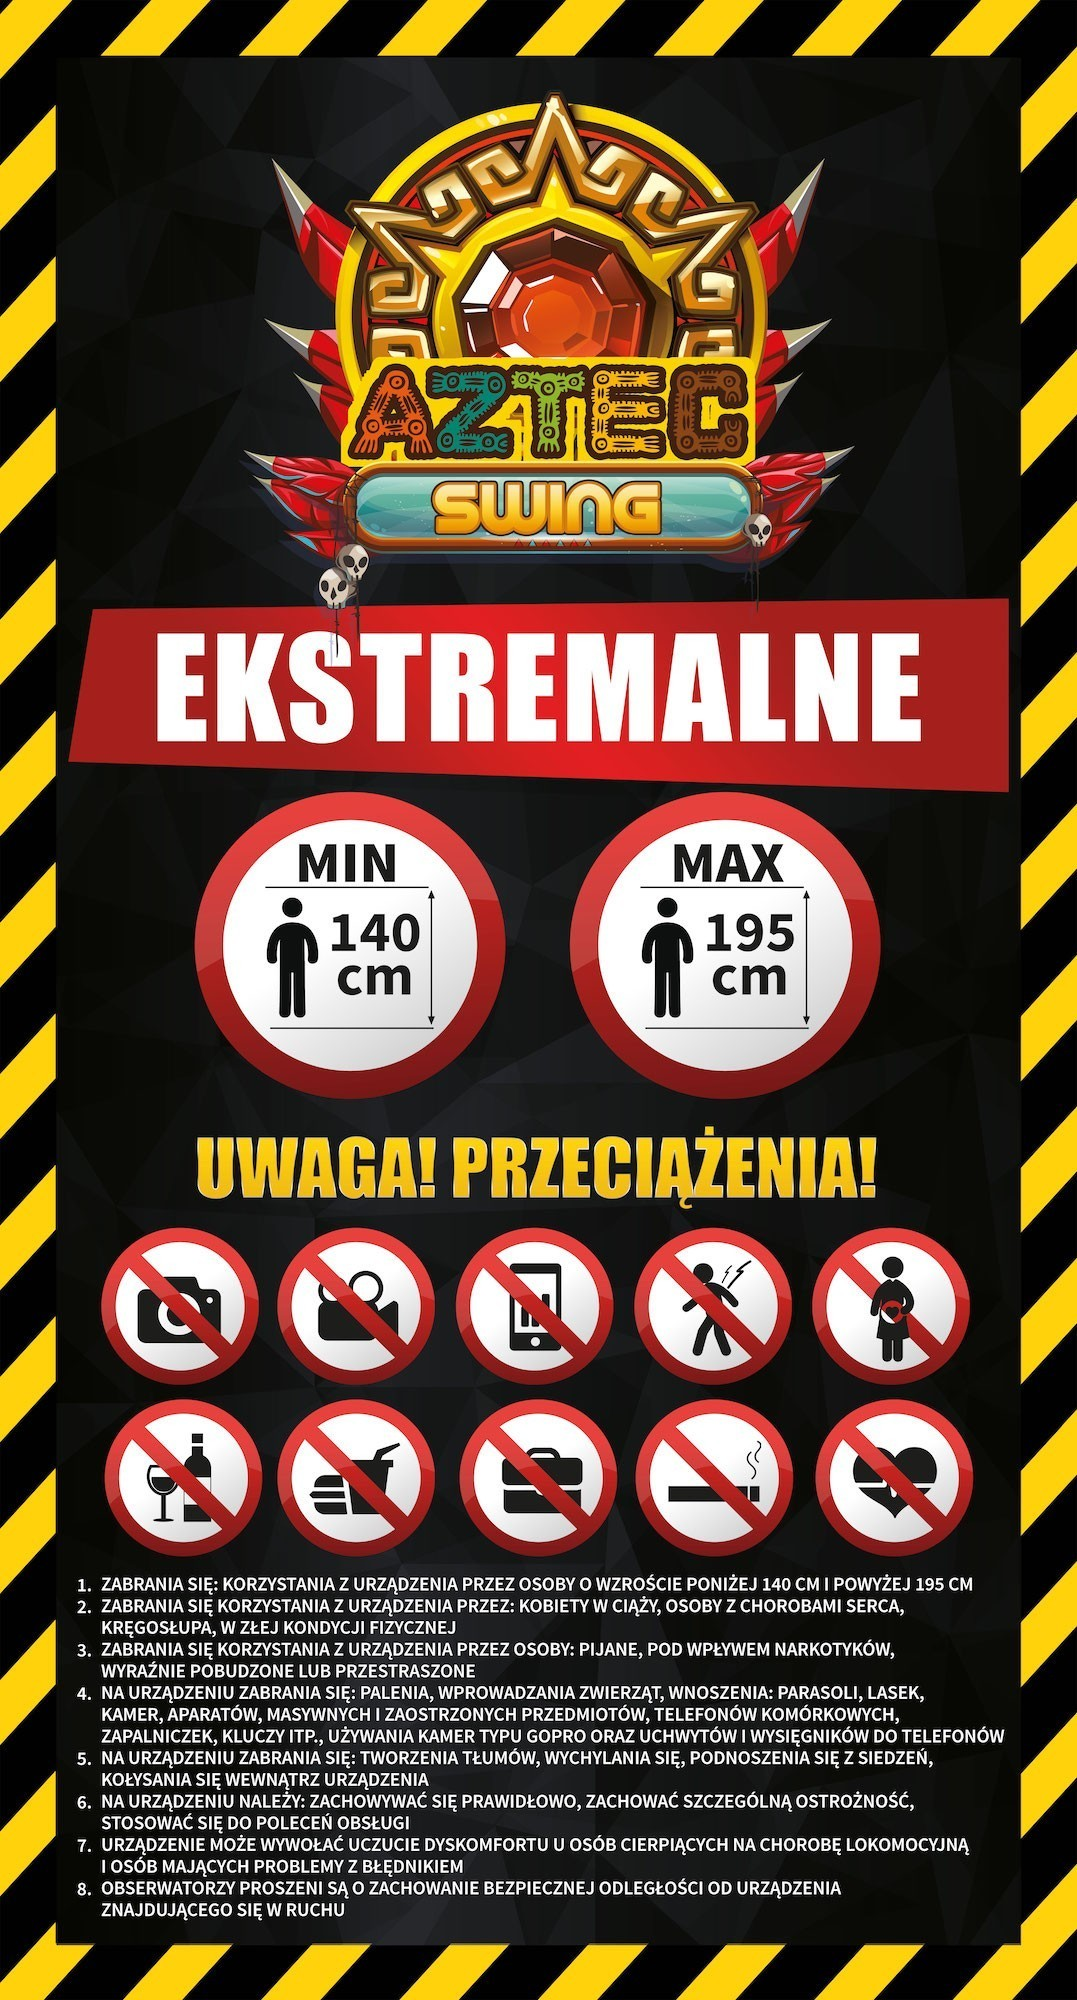 ekstremalne-aztec-swing